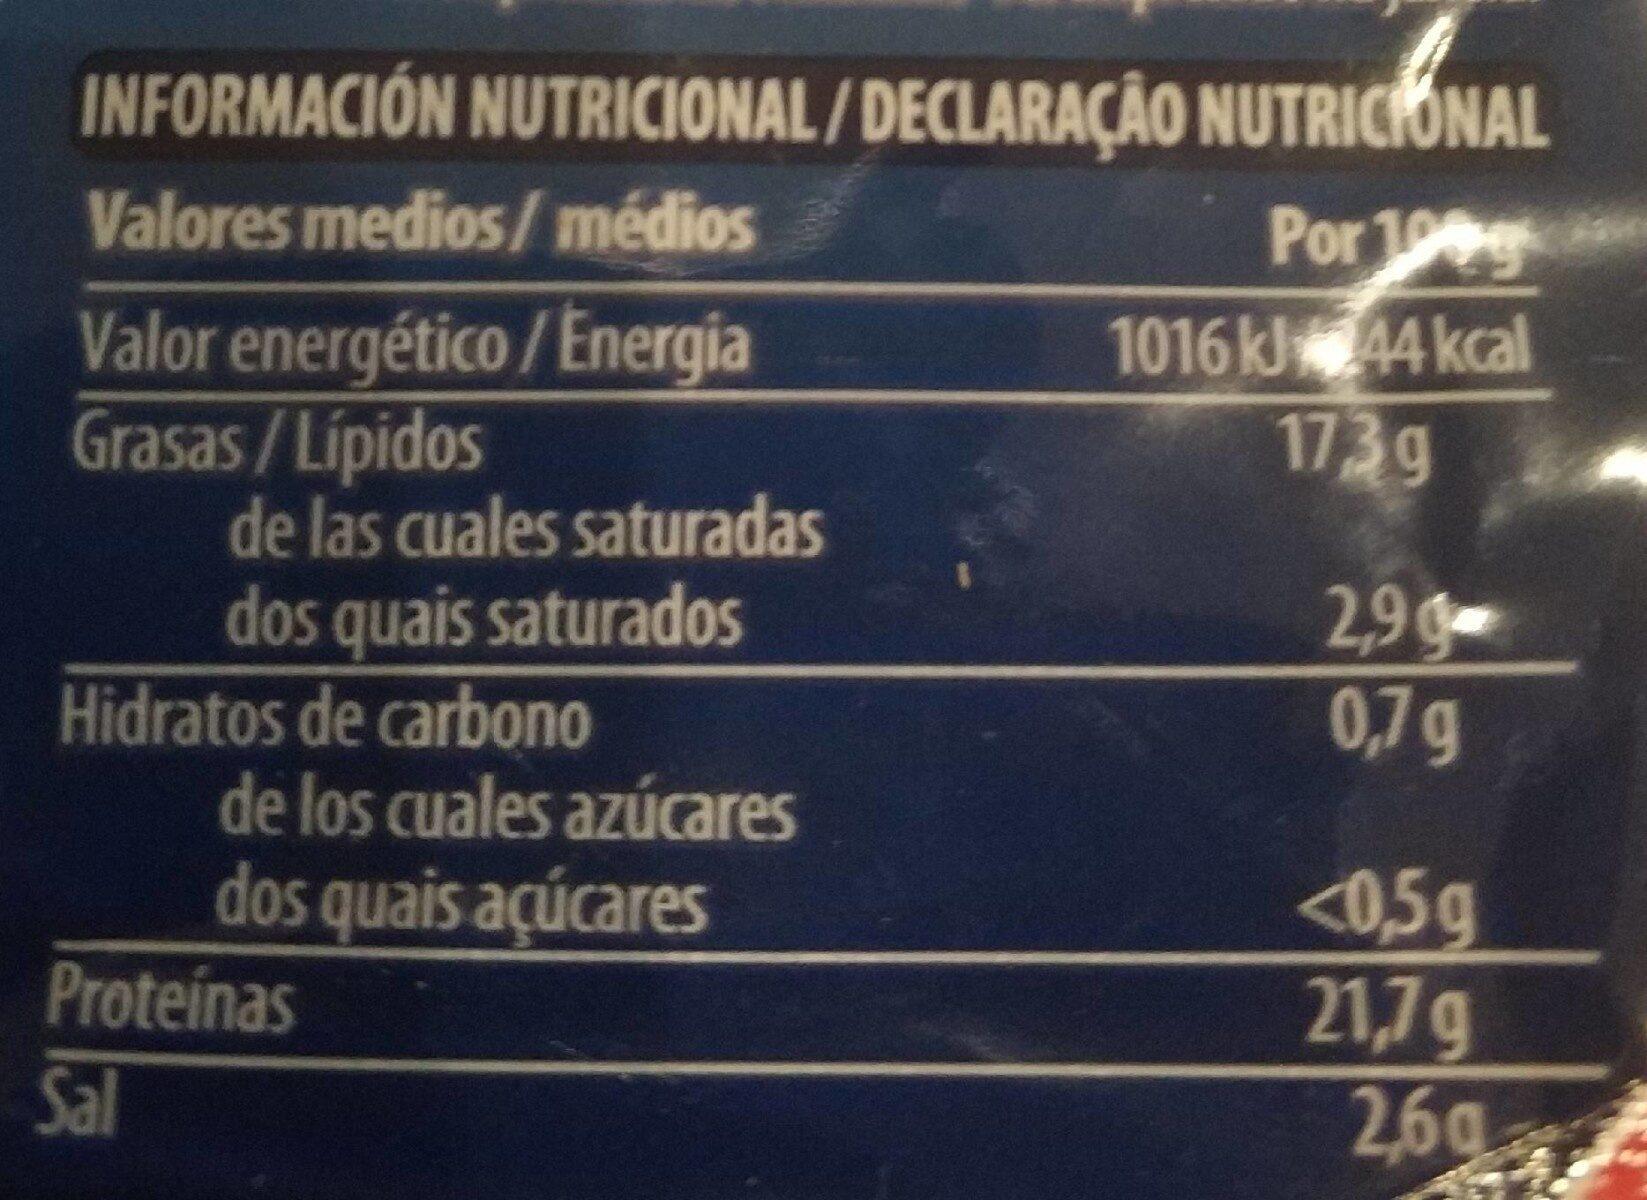 Salmón ahumado - Informació nutricional